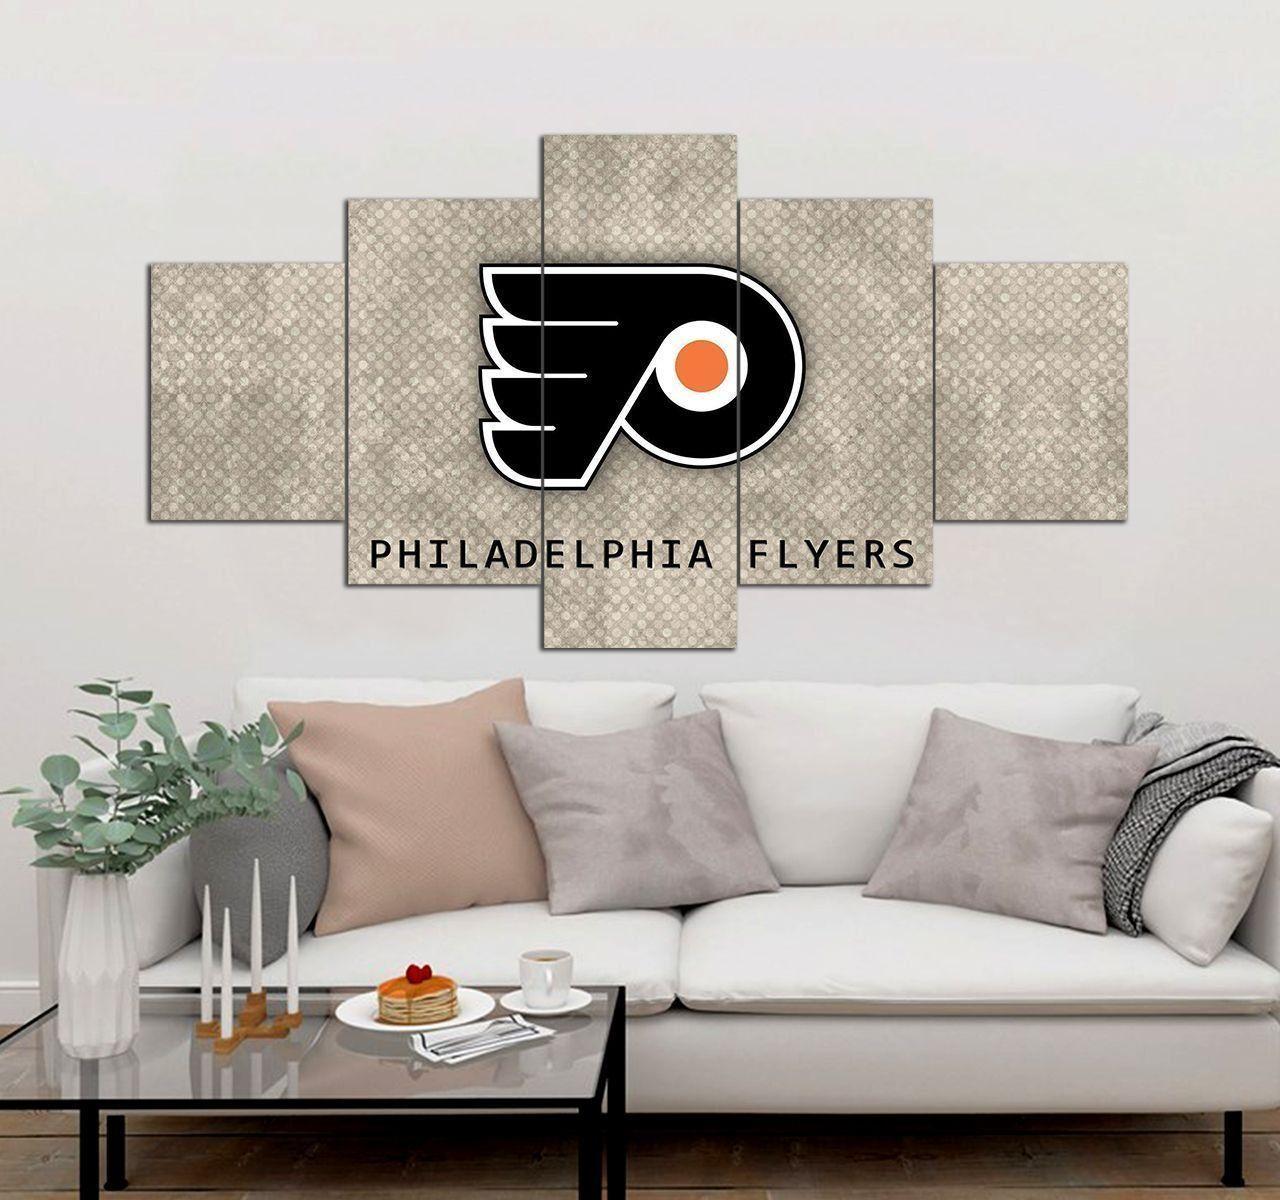 Philadelphia Flyers Canvas Wall Art 5 Piece Canvas Art Prints Set De Trong 2020